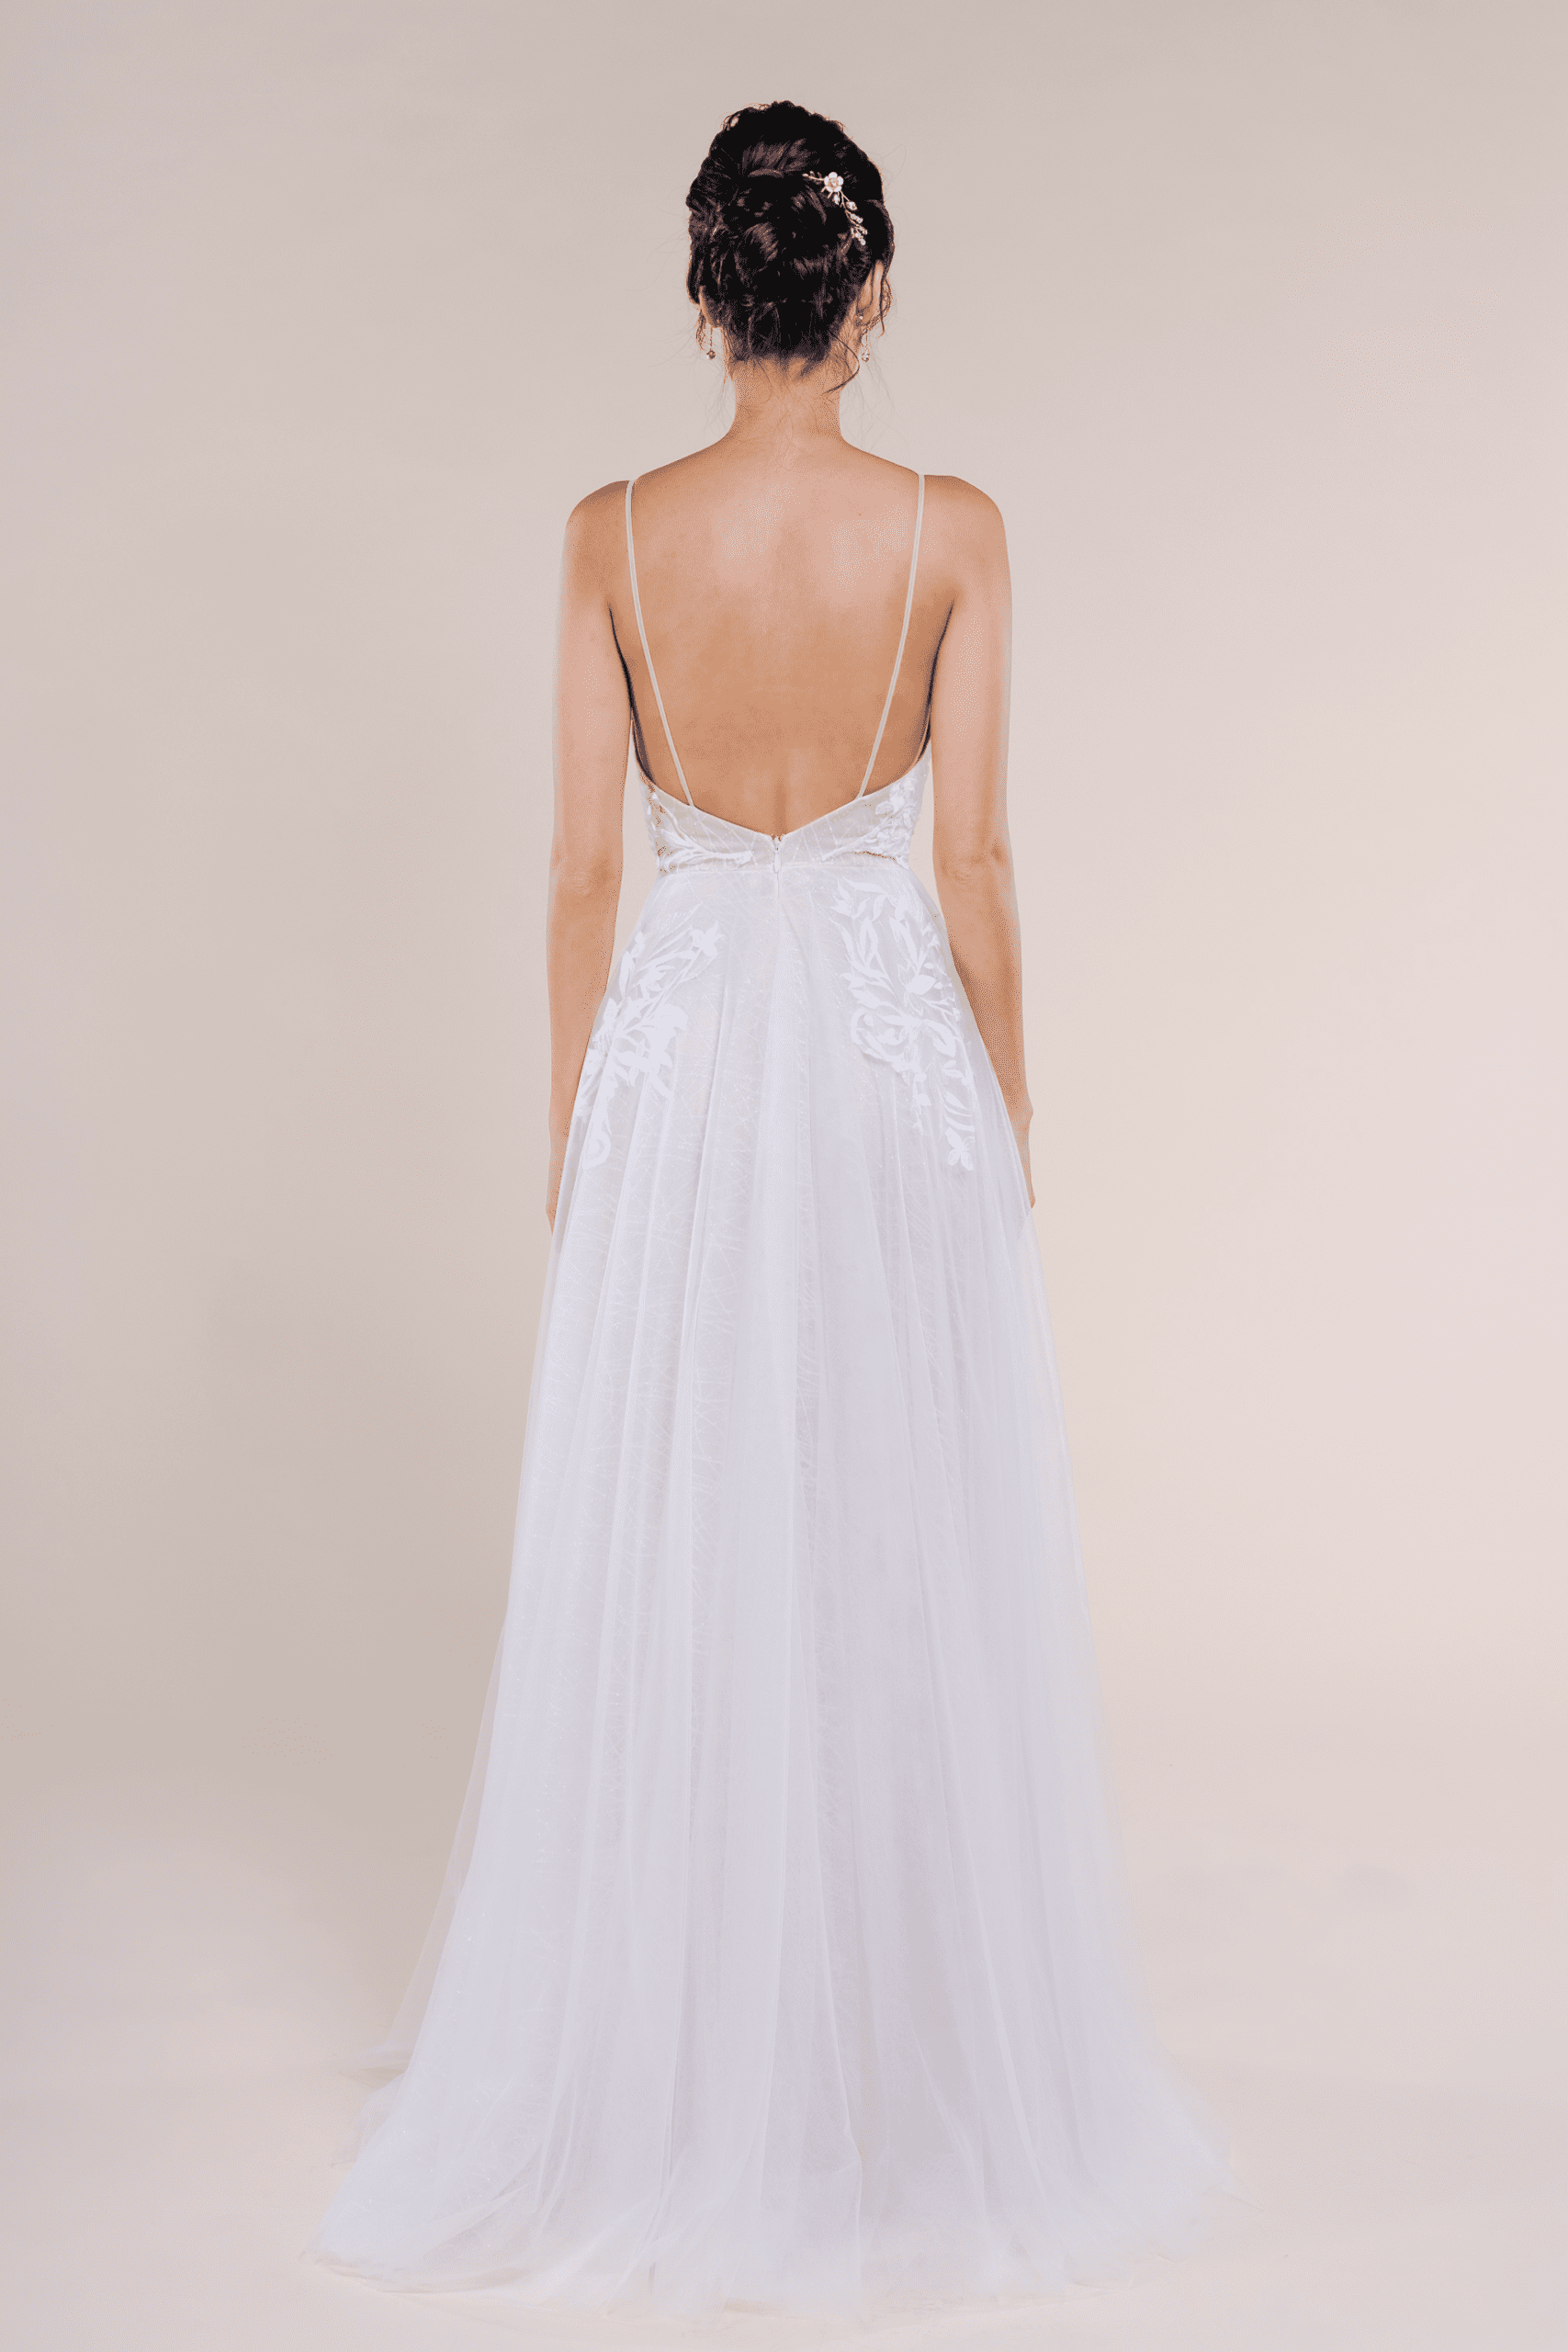 Paige-Singapore-Designer-Gown